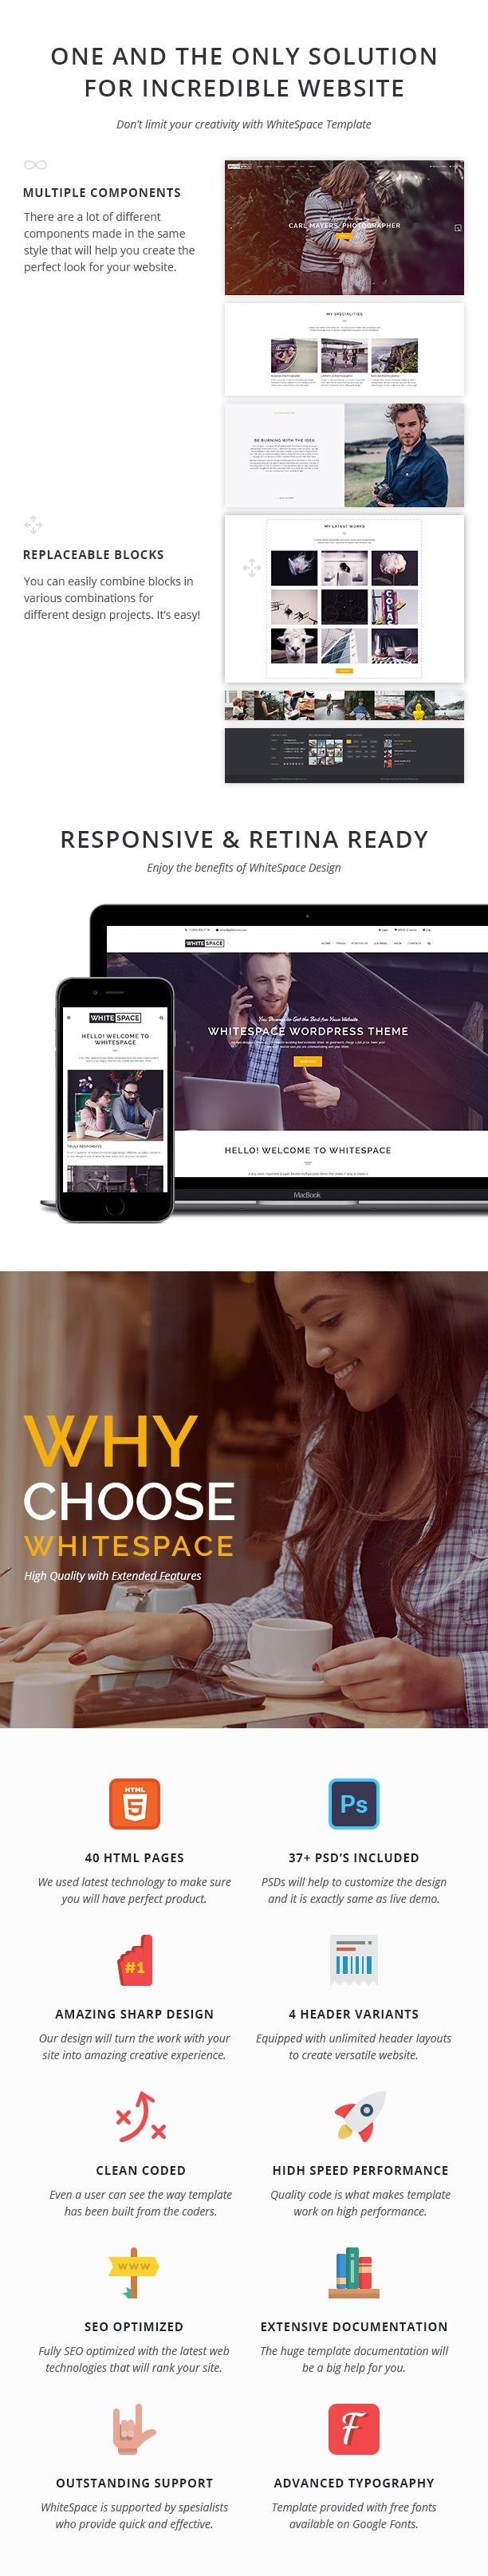 Portfolio HTML Template - WhiteSpace - 3